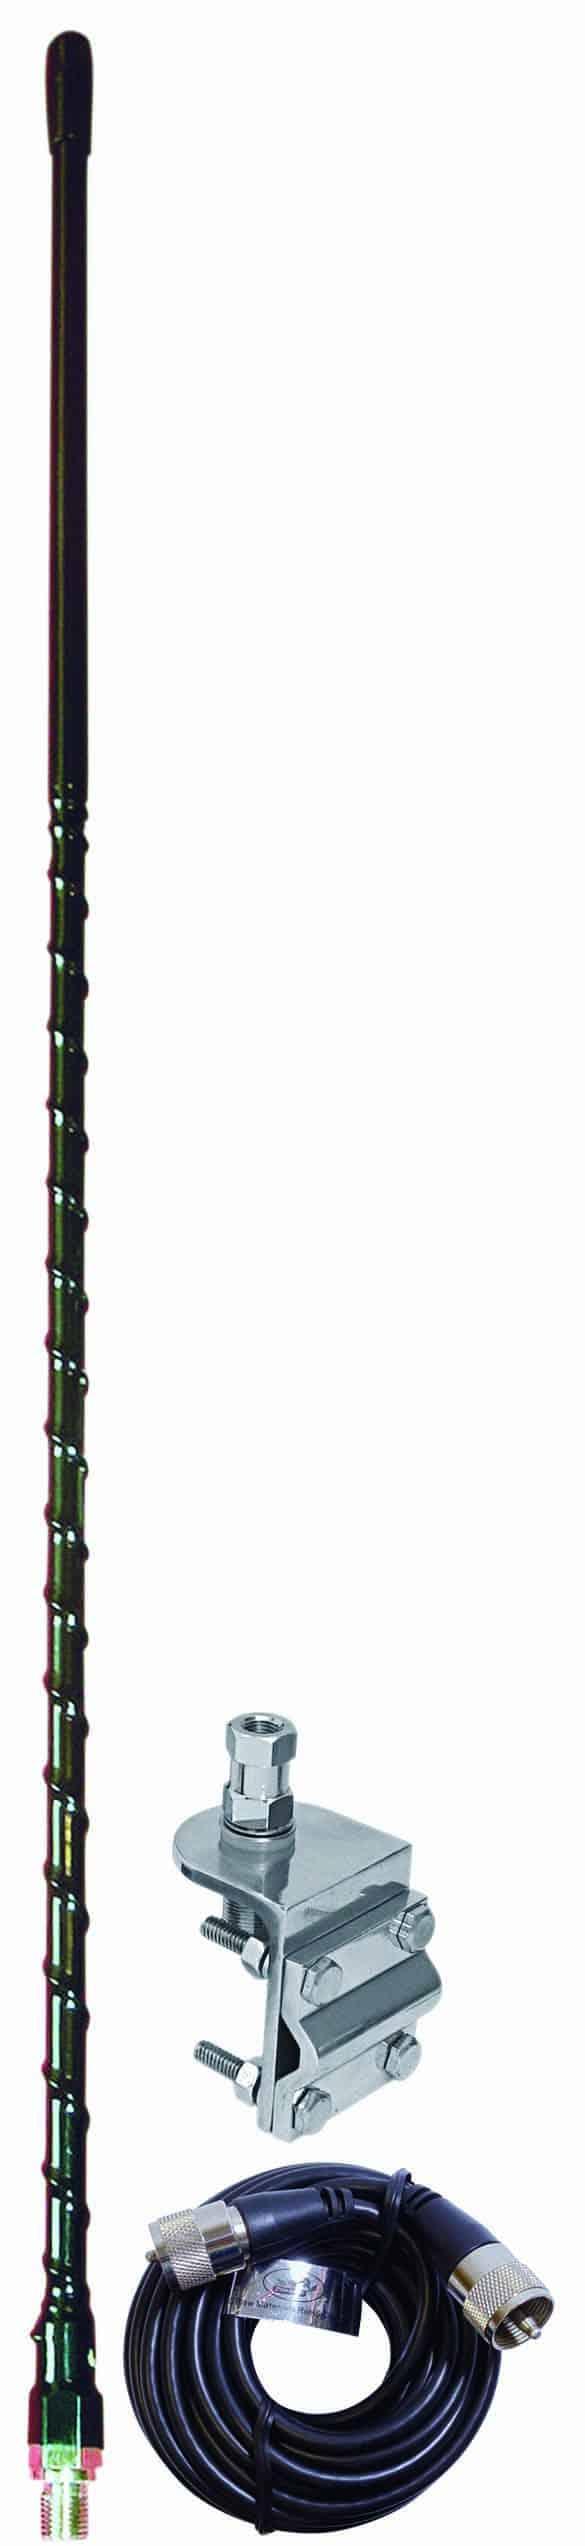 AUMM13-B - 3' Black Single 3-Way So239 Mirror Mount CB Antenna Kit